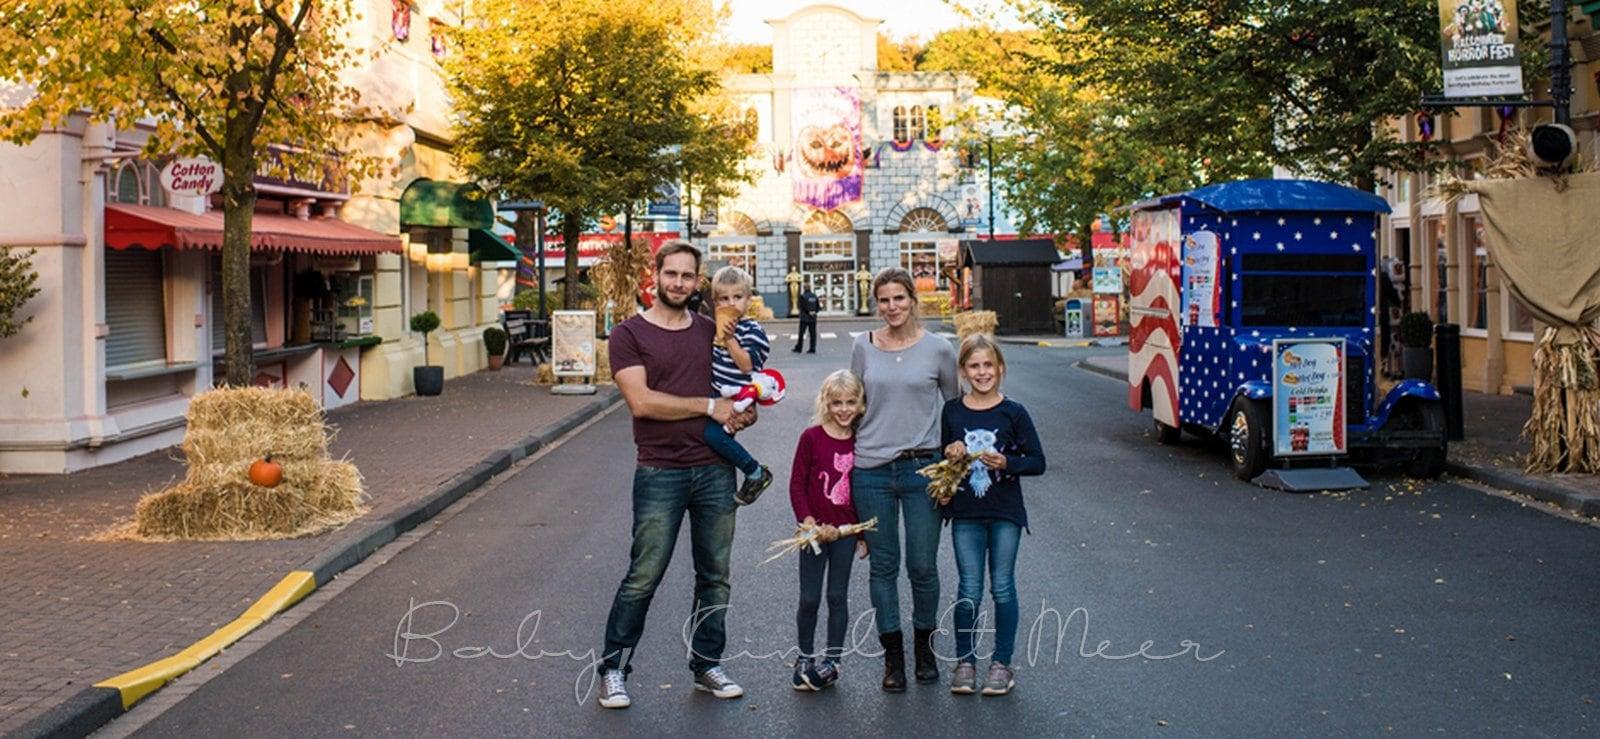 Familienausflug Moviepark Bottrop